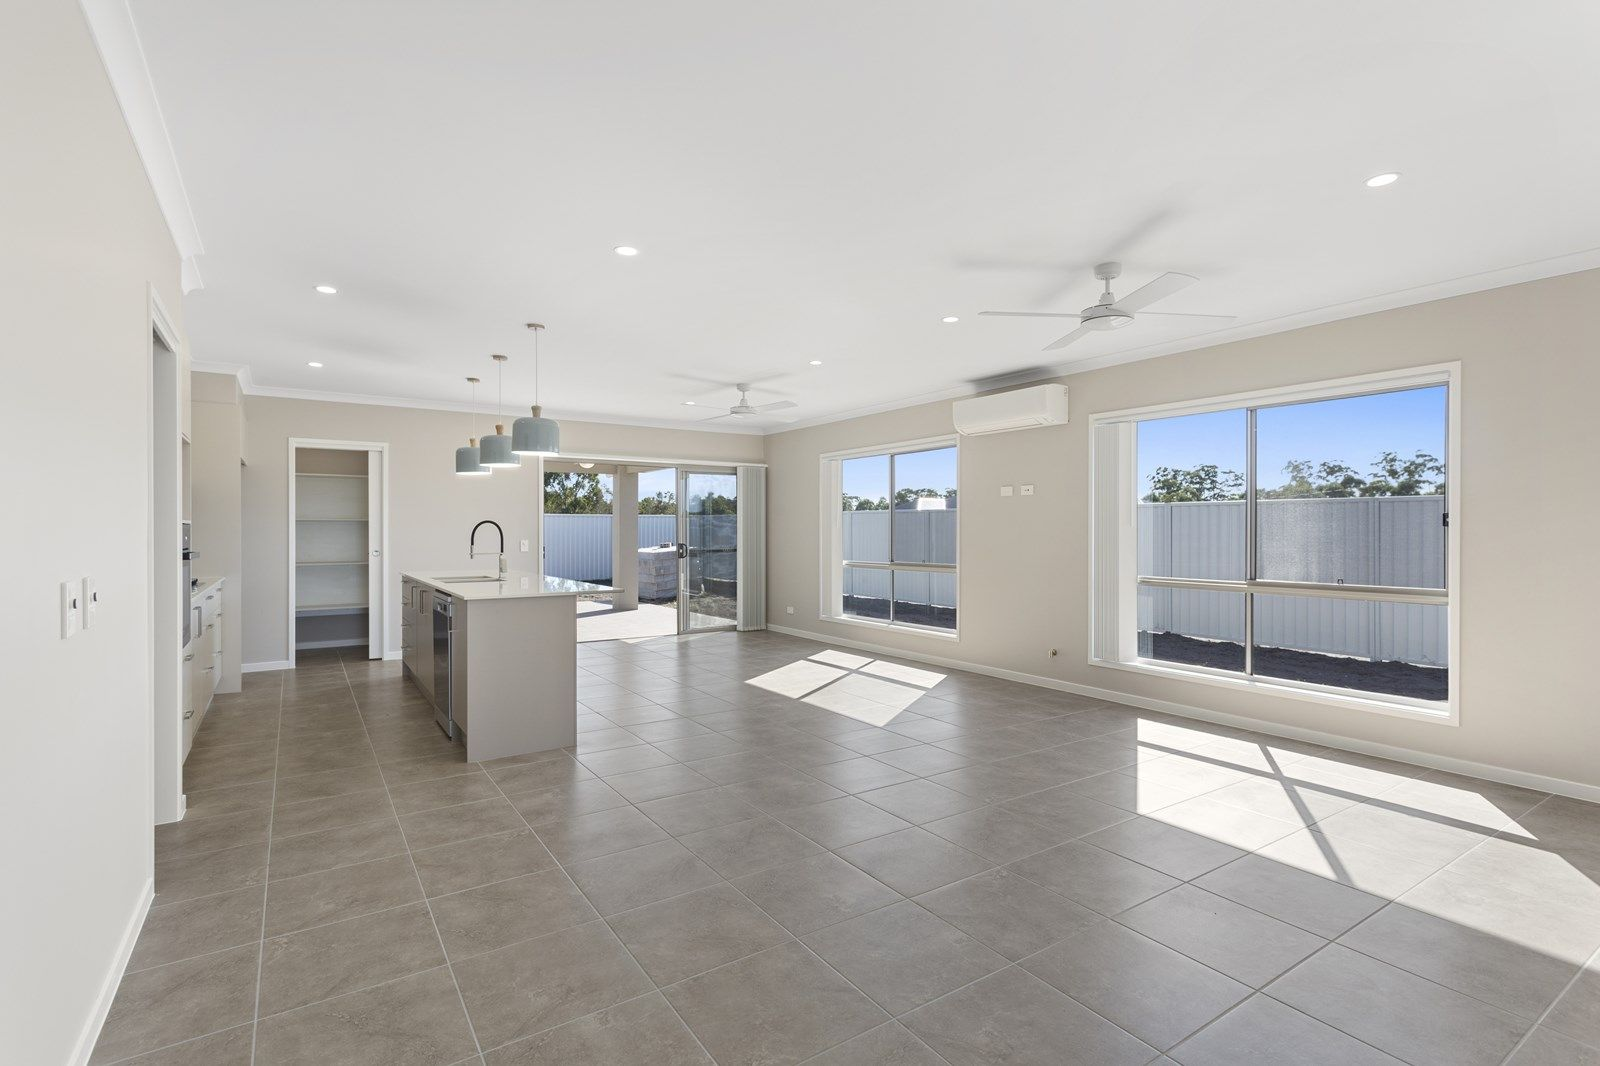 Lot 5 Cedarwood Place, Landsborough QLD 4550, Image 1